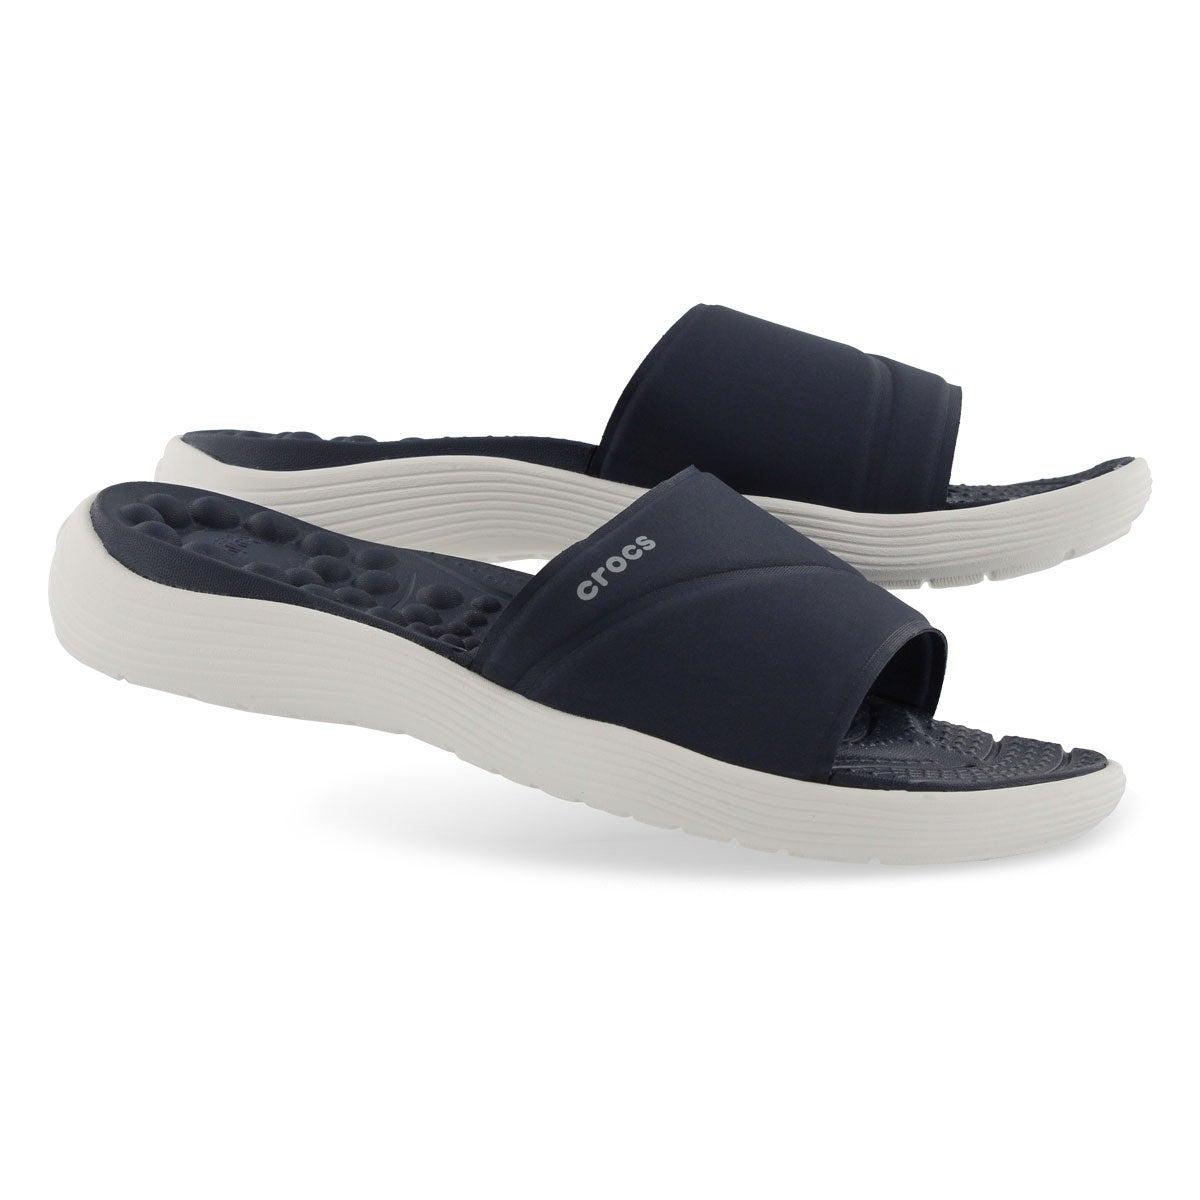 Sandale enfil. Reviva Slide,mrn/blc ,fem